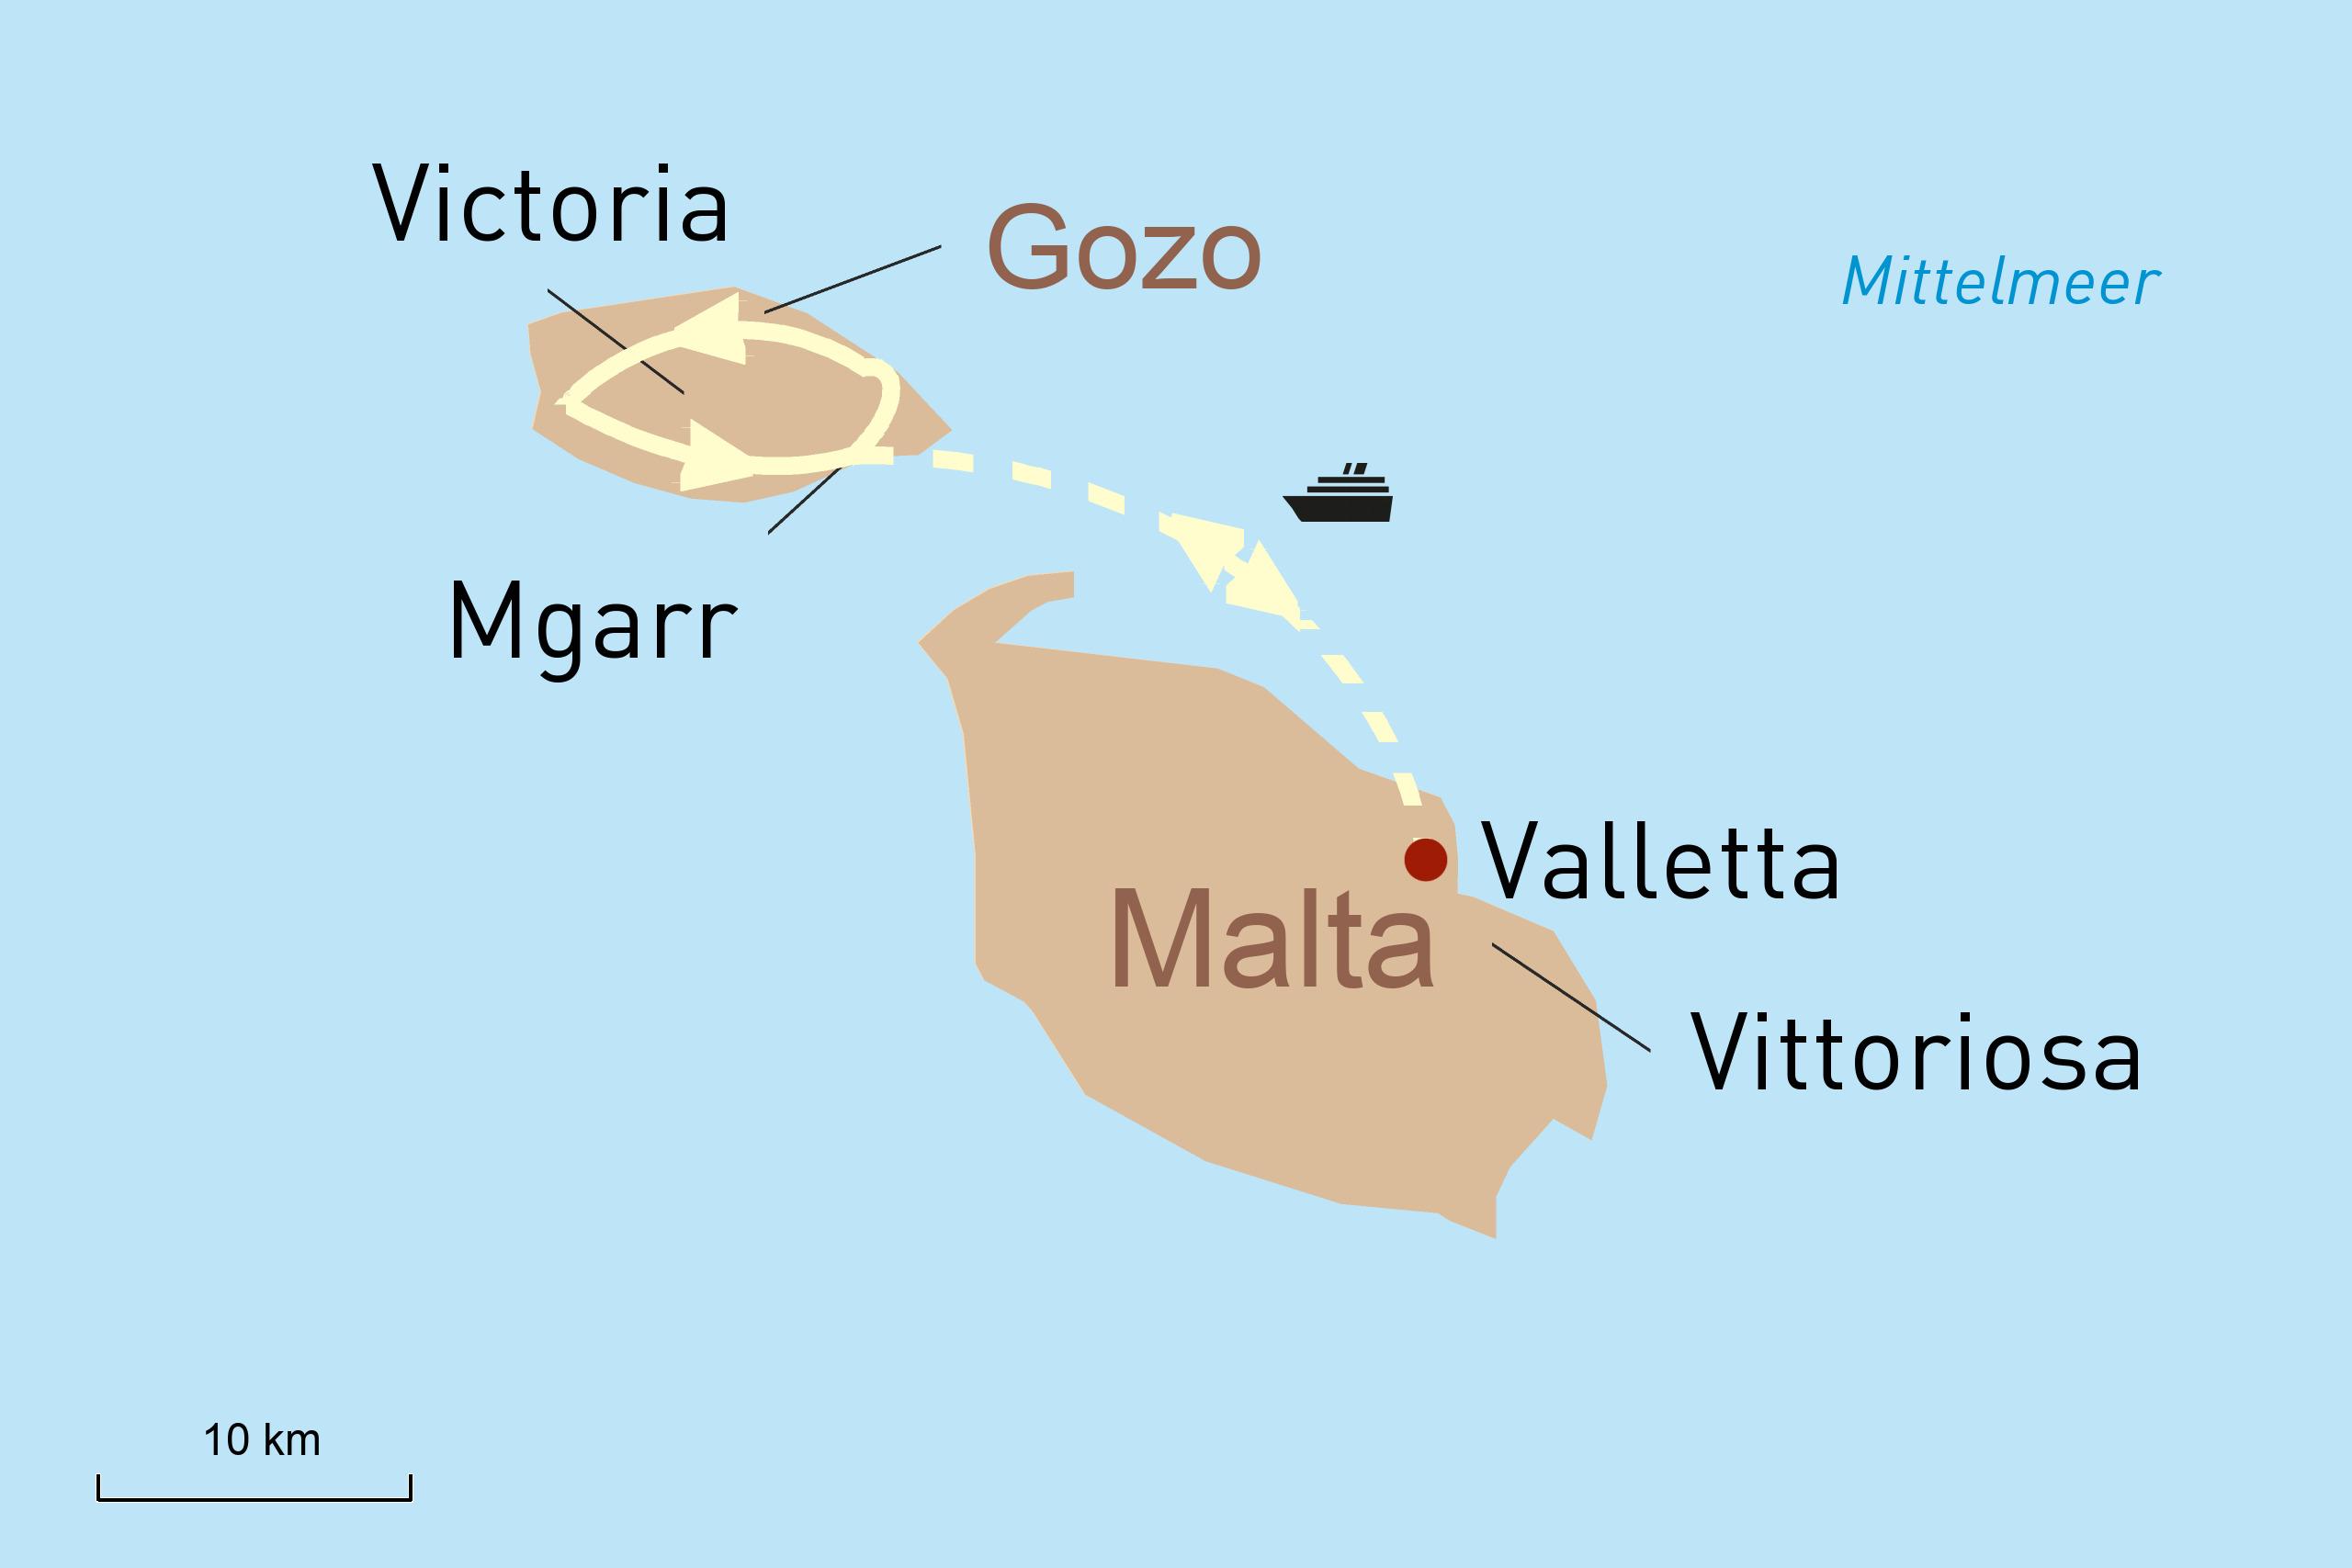 Drei Perfekte Tage auf Malta neu